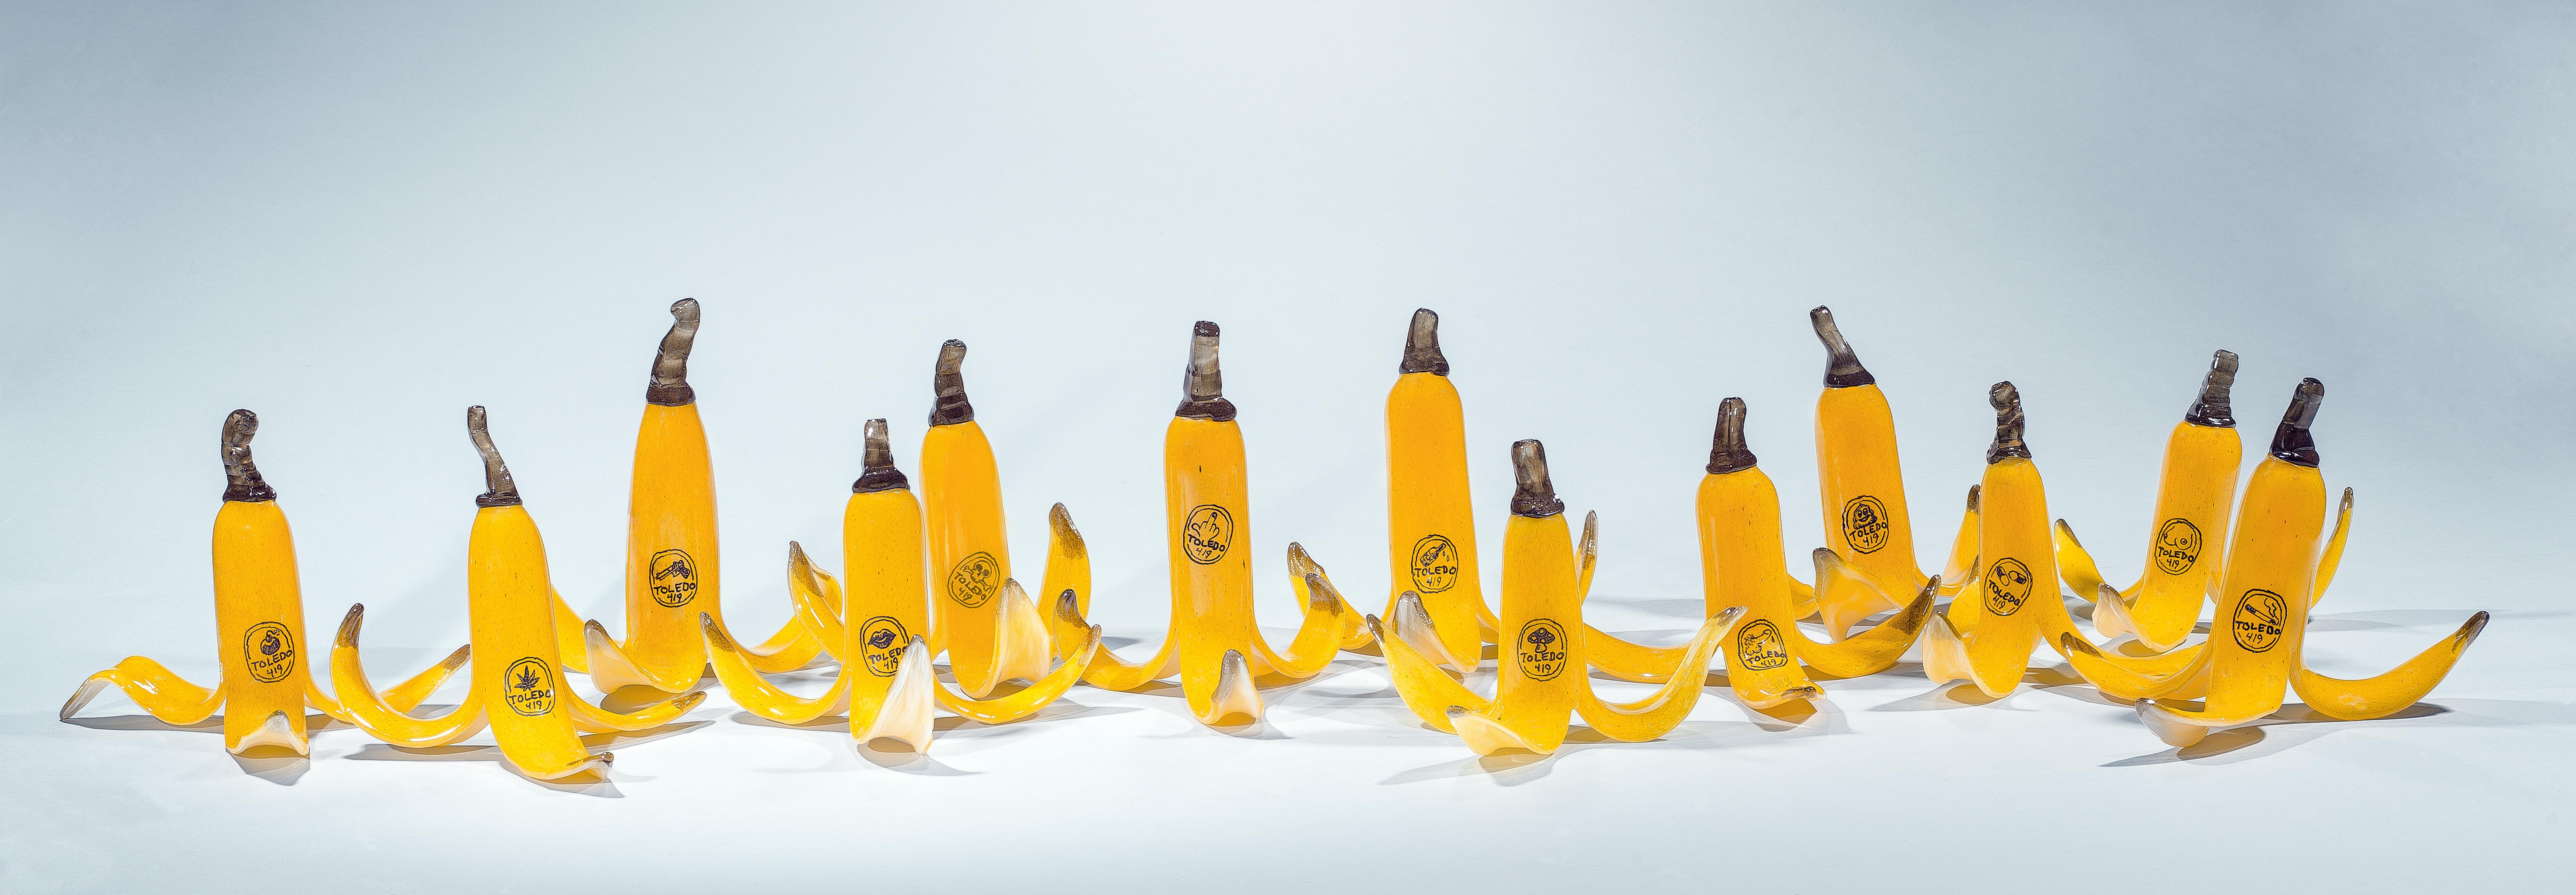 Toledo Bananas 2015 Bunch